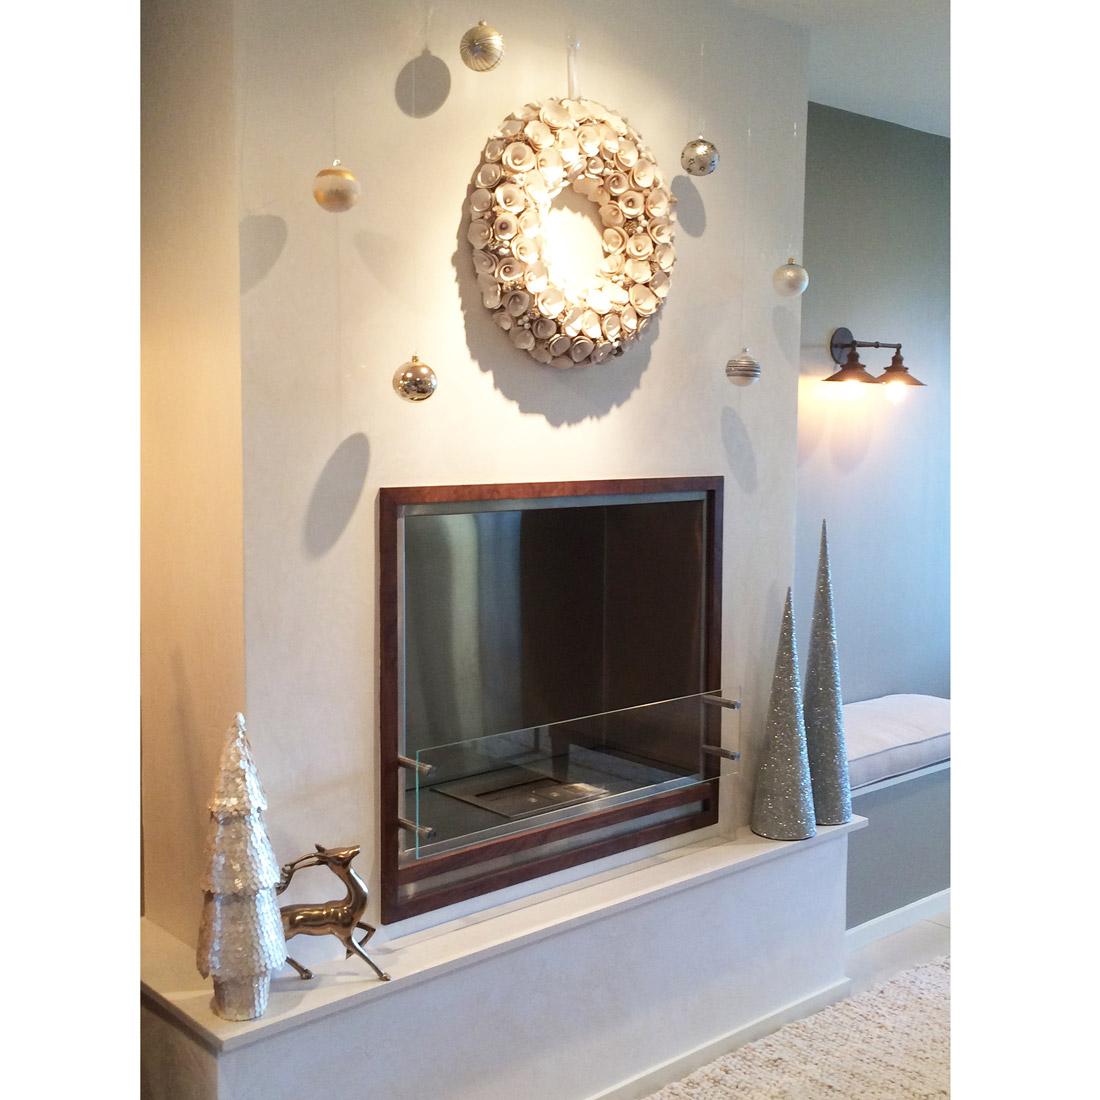 holiday wreath and decor adorn a venetian plaster white modern fireplace design by sara bates interior design